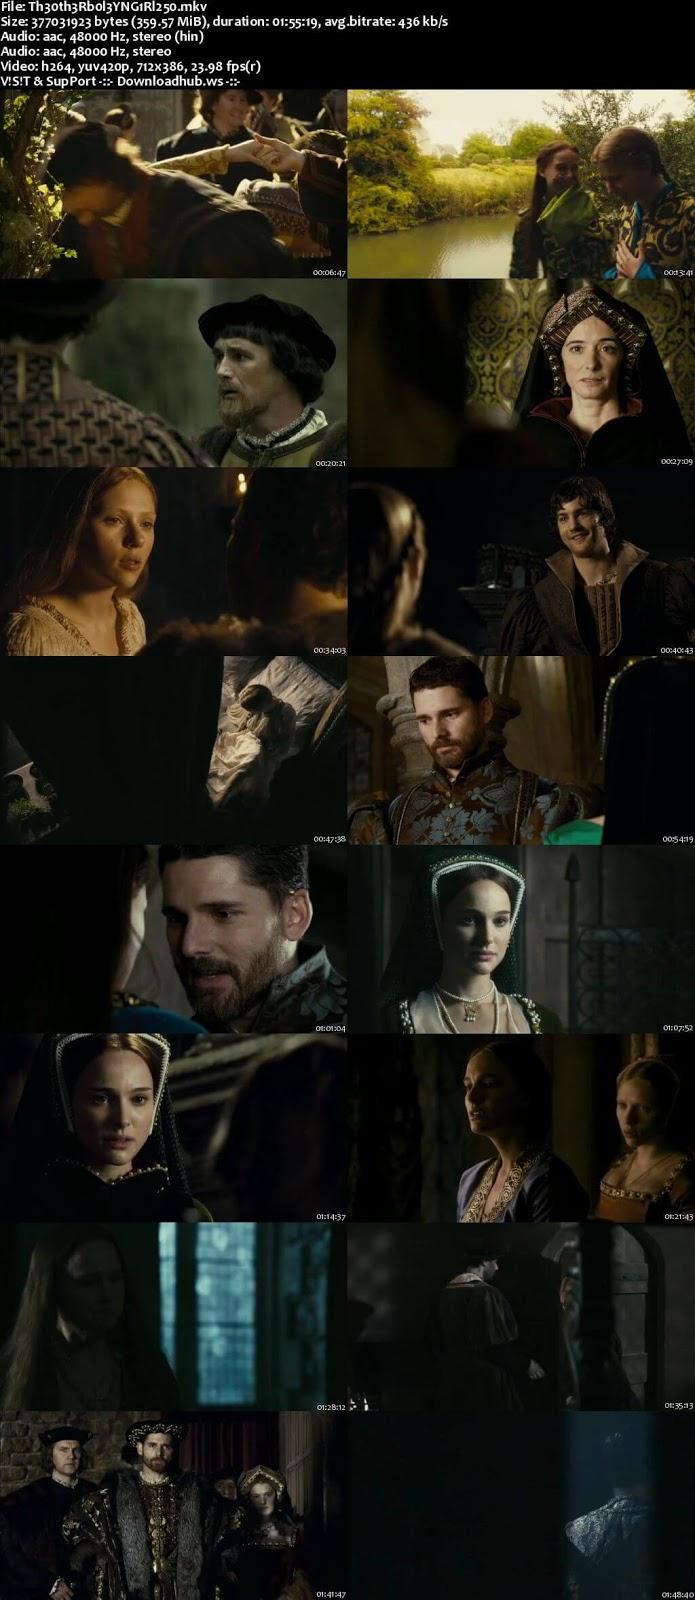 The Other Boleyn Girl 2008 Hindi Dual Audio 480p BluRay Free Download